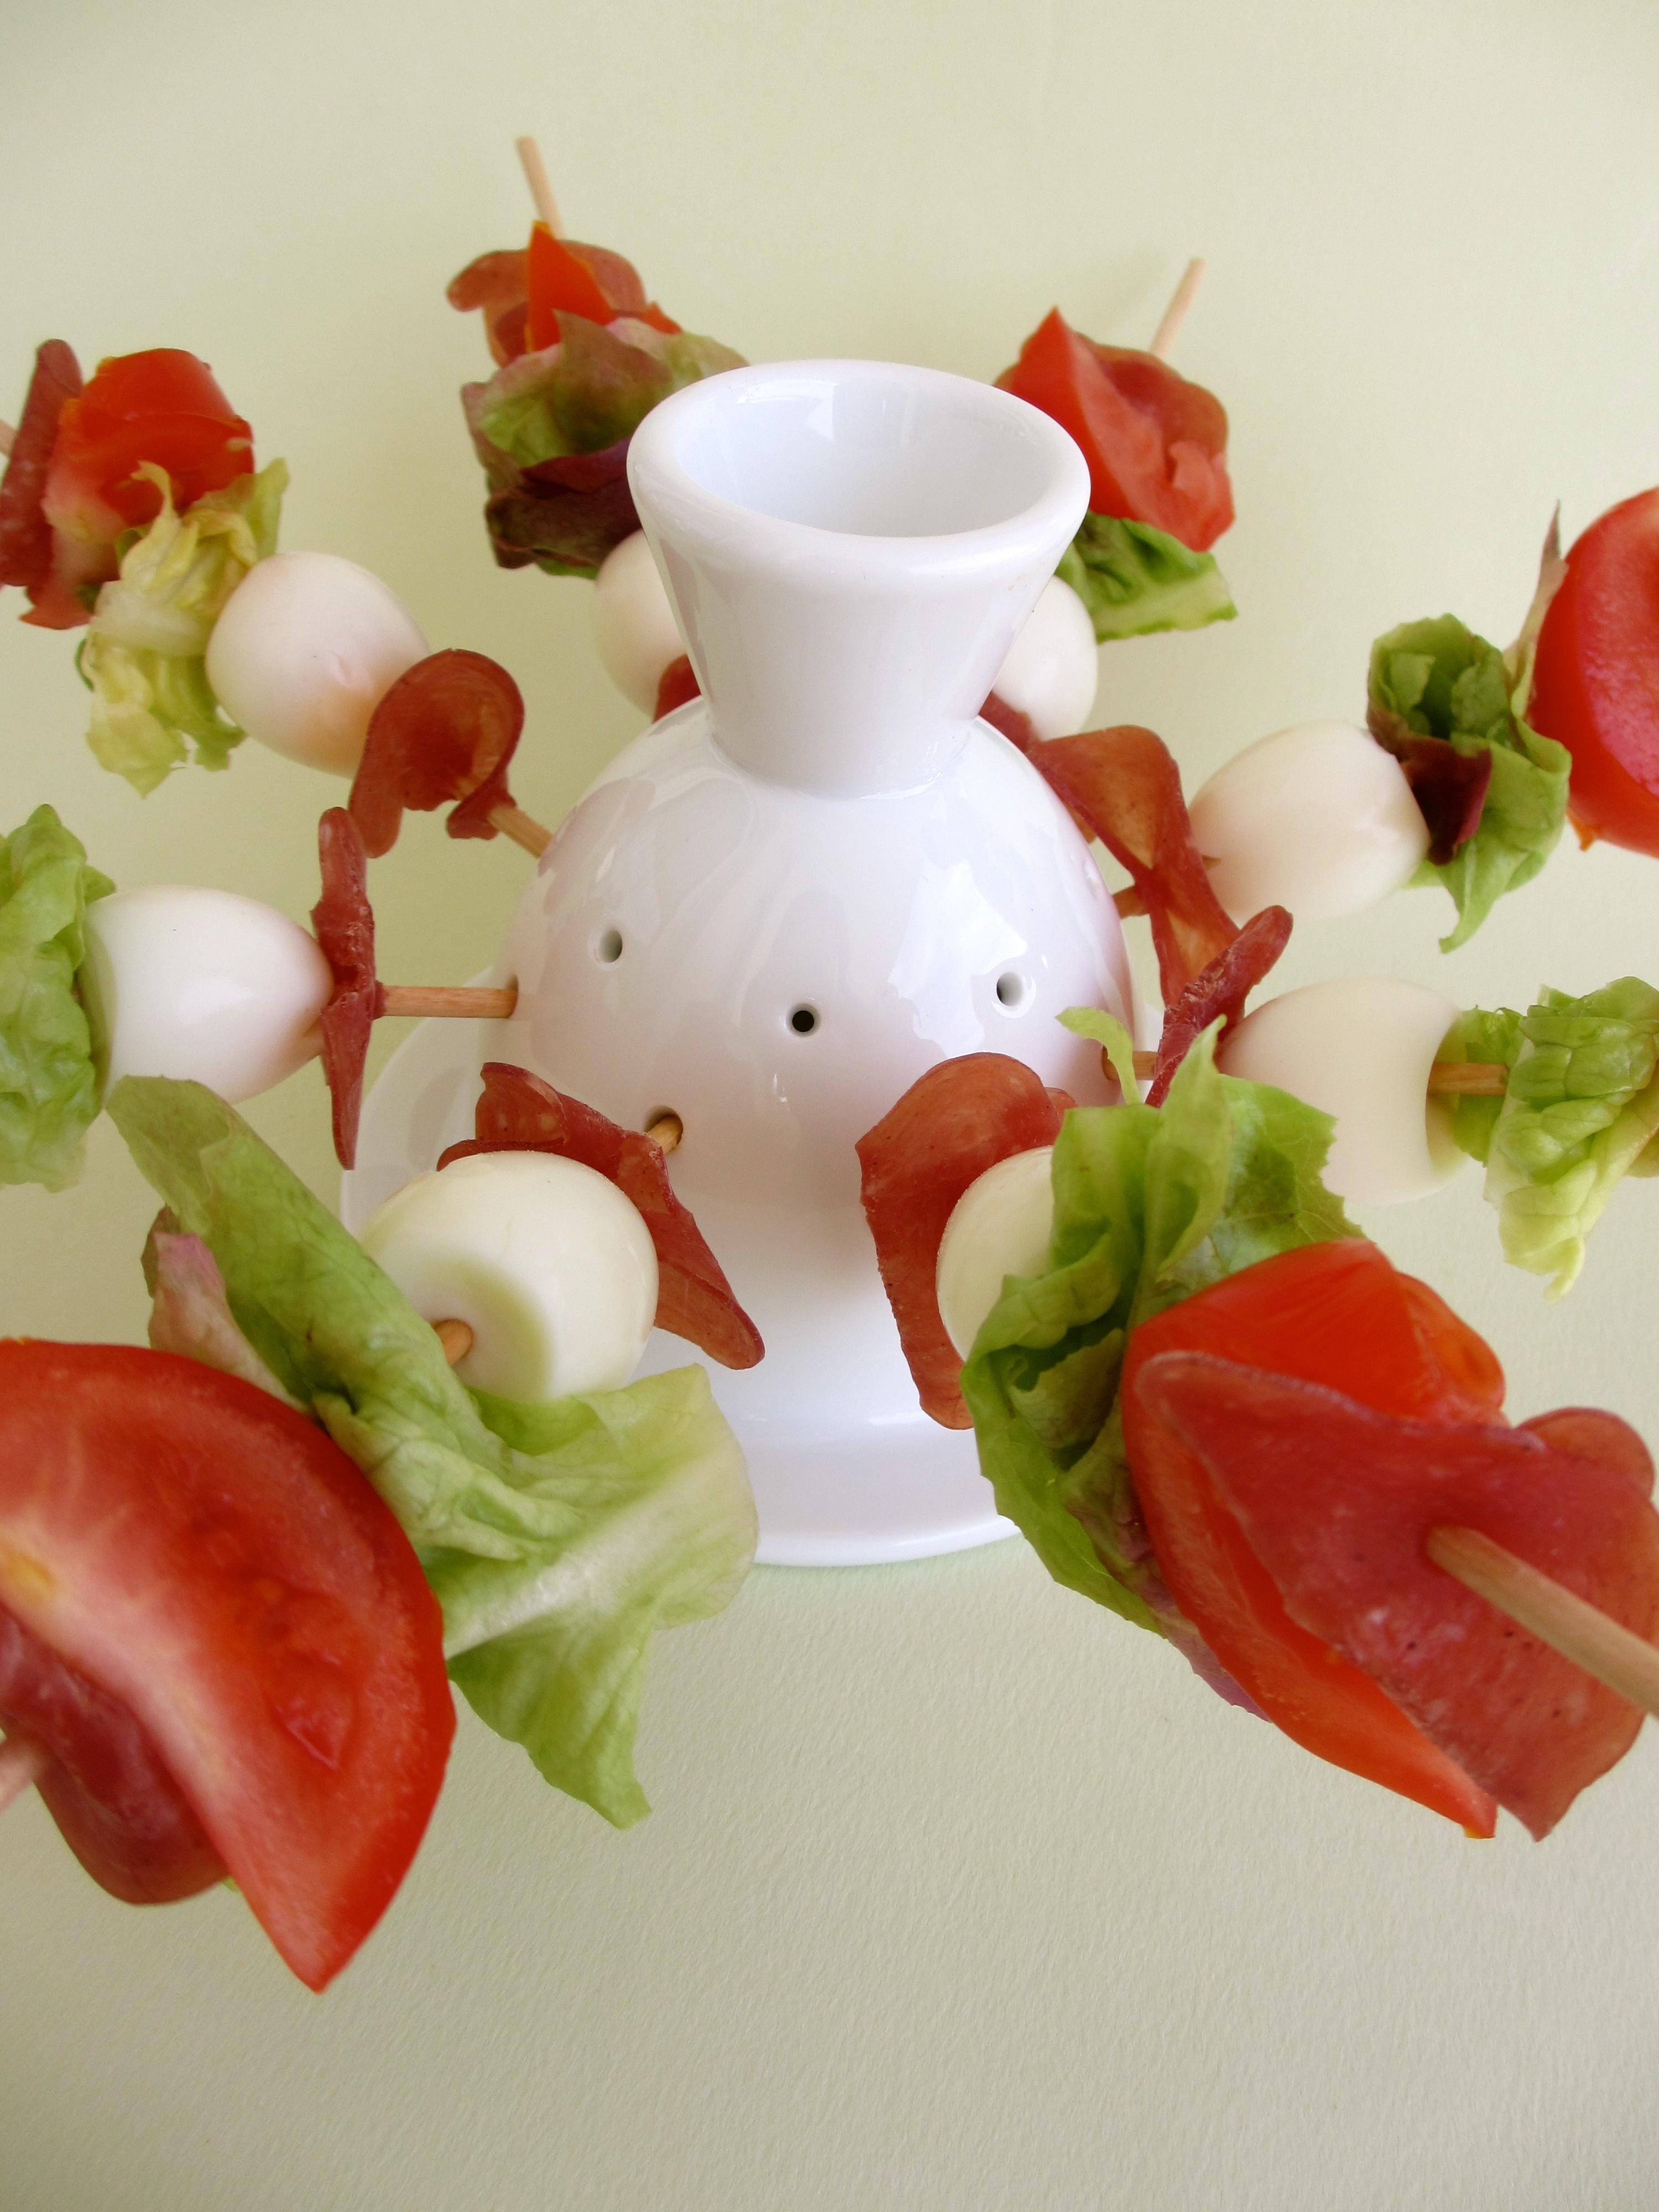 Brochettes apéritives fines tranches de saucisson – tomate – oeuf de caille